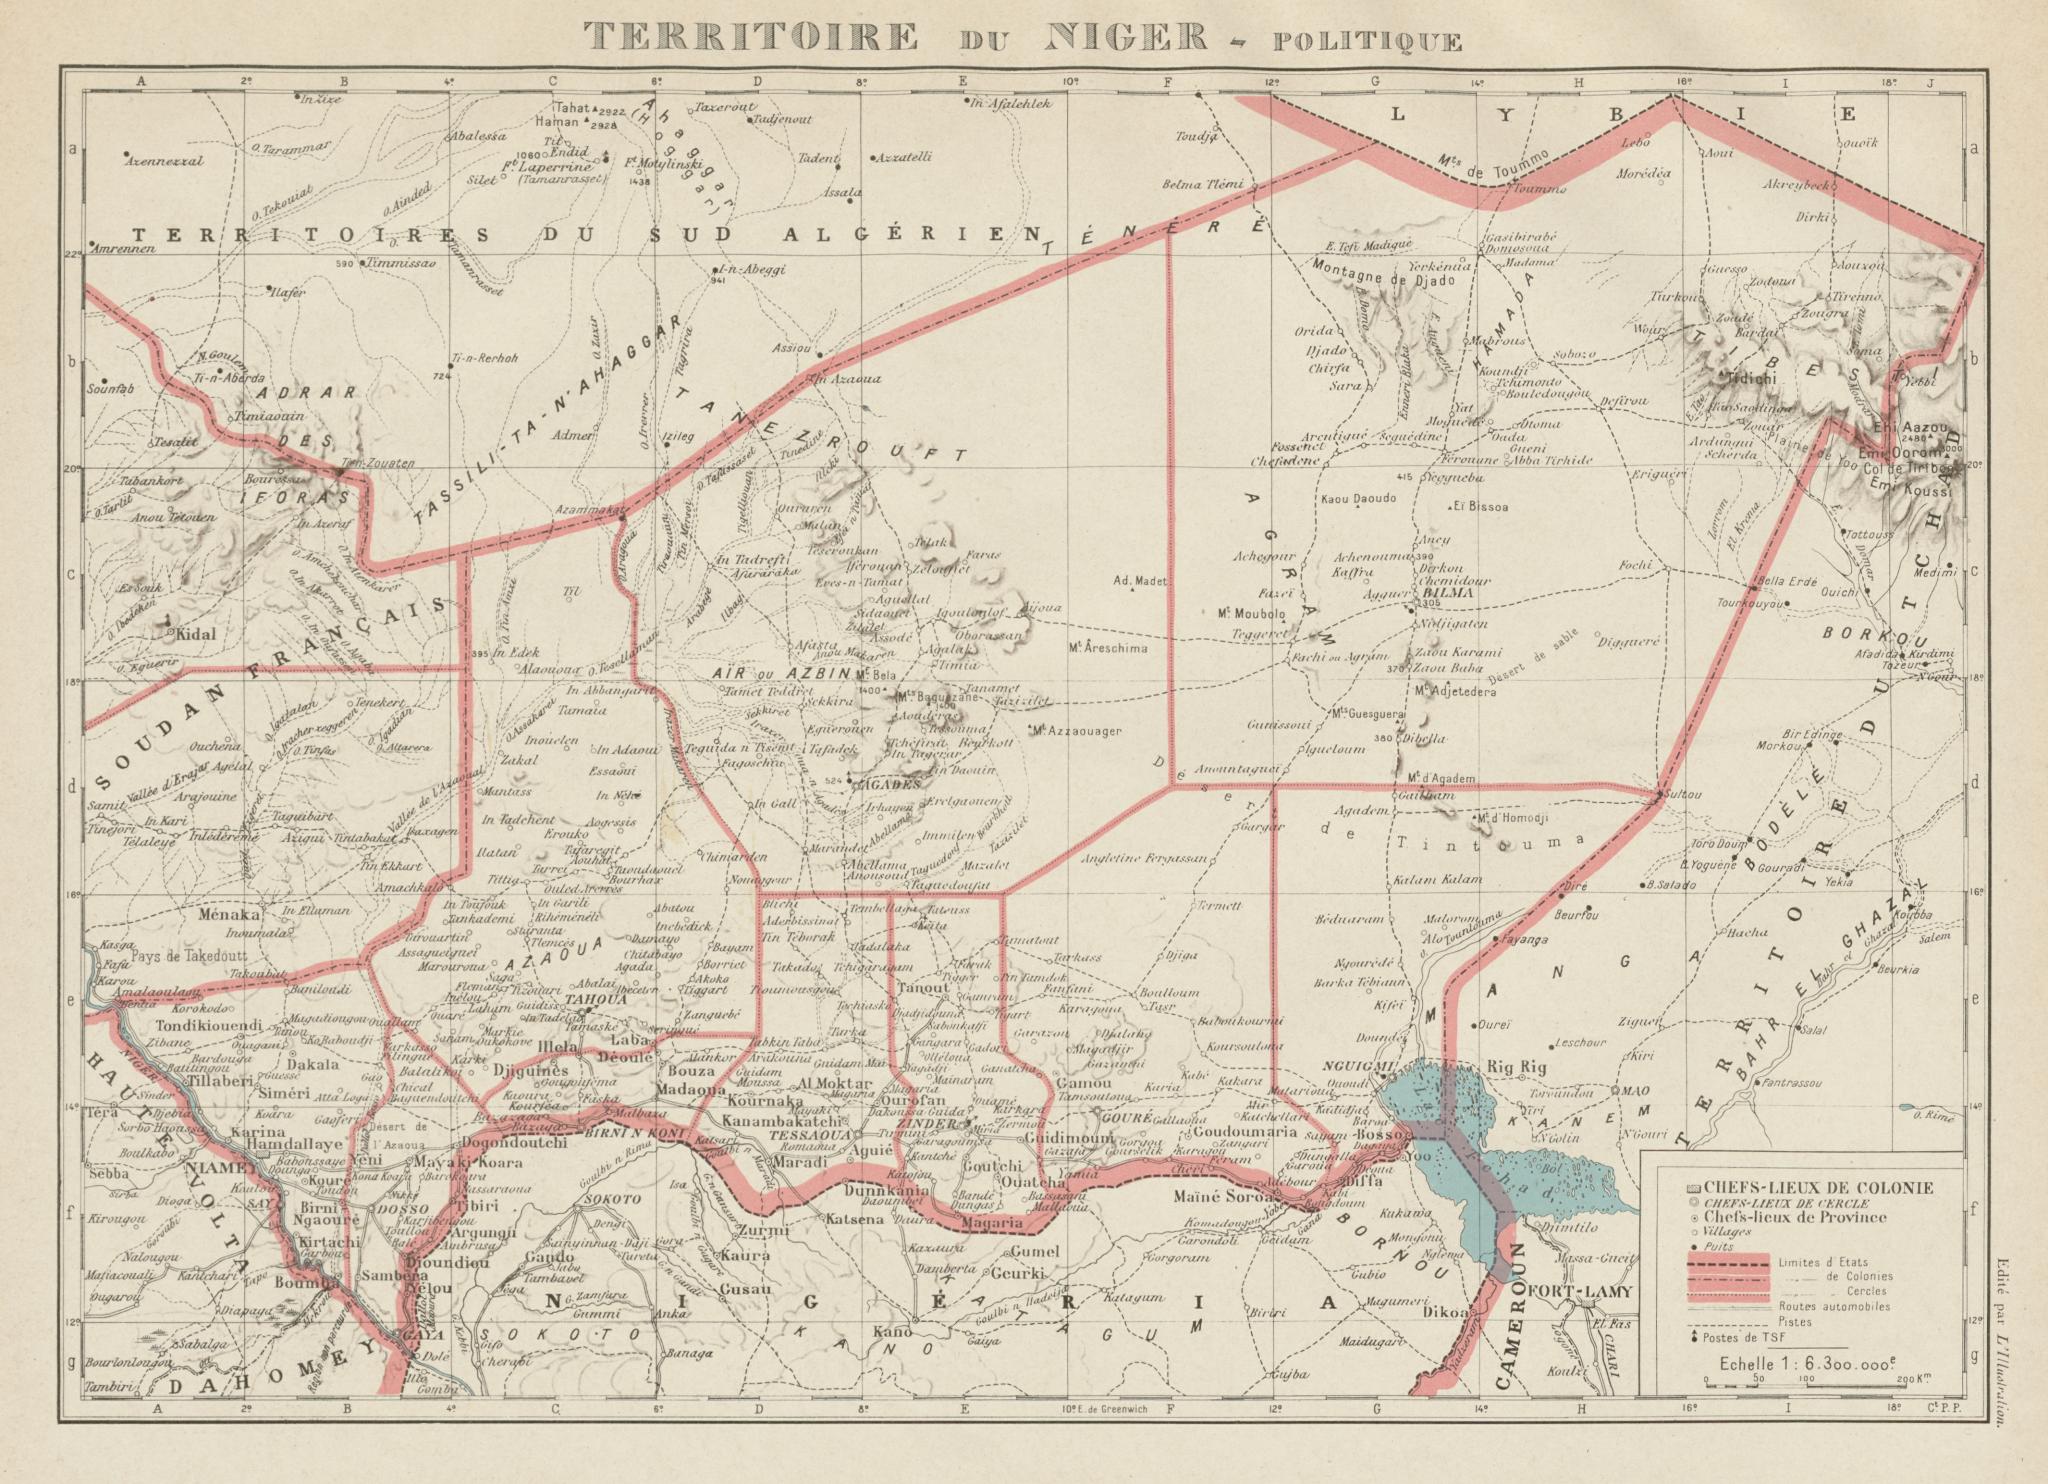 Associate Product TERRITOIRE DU NIGER. French West Africa. Afrique Occidentale Française 1929 map